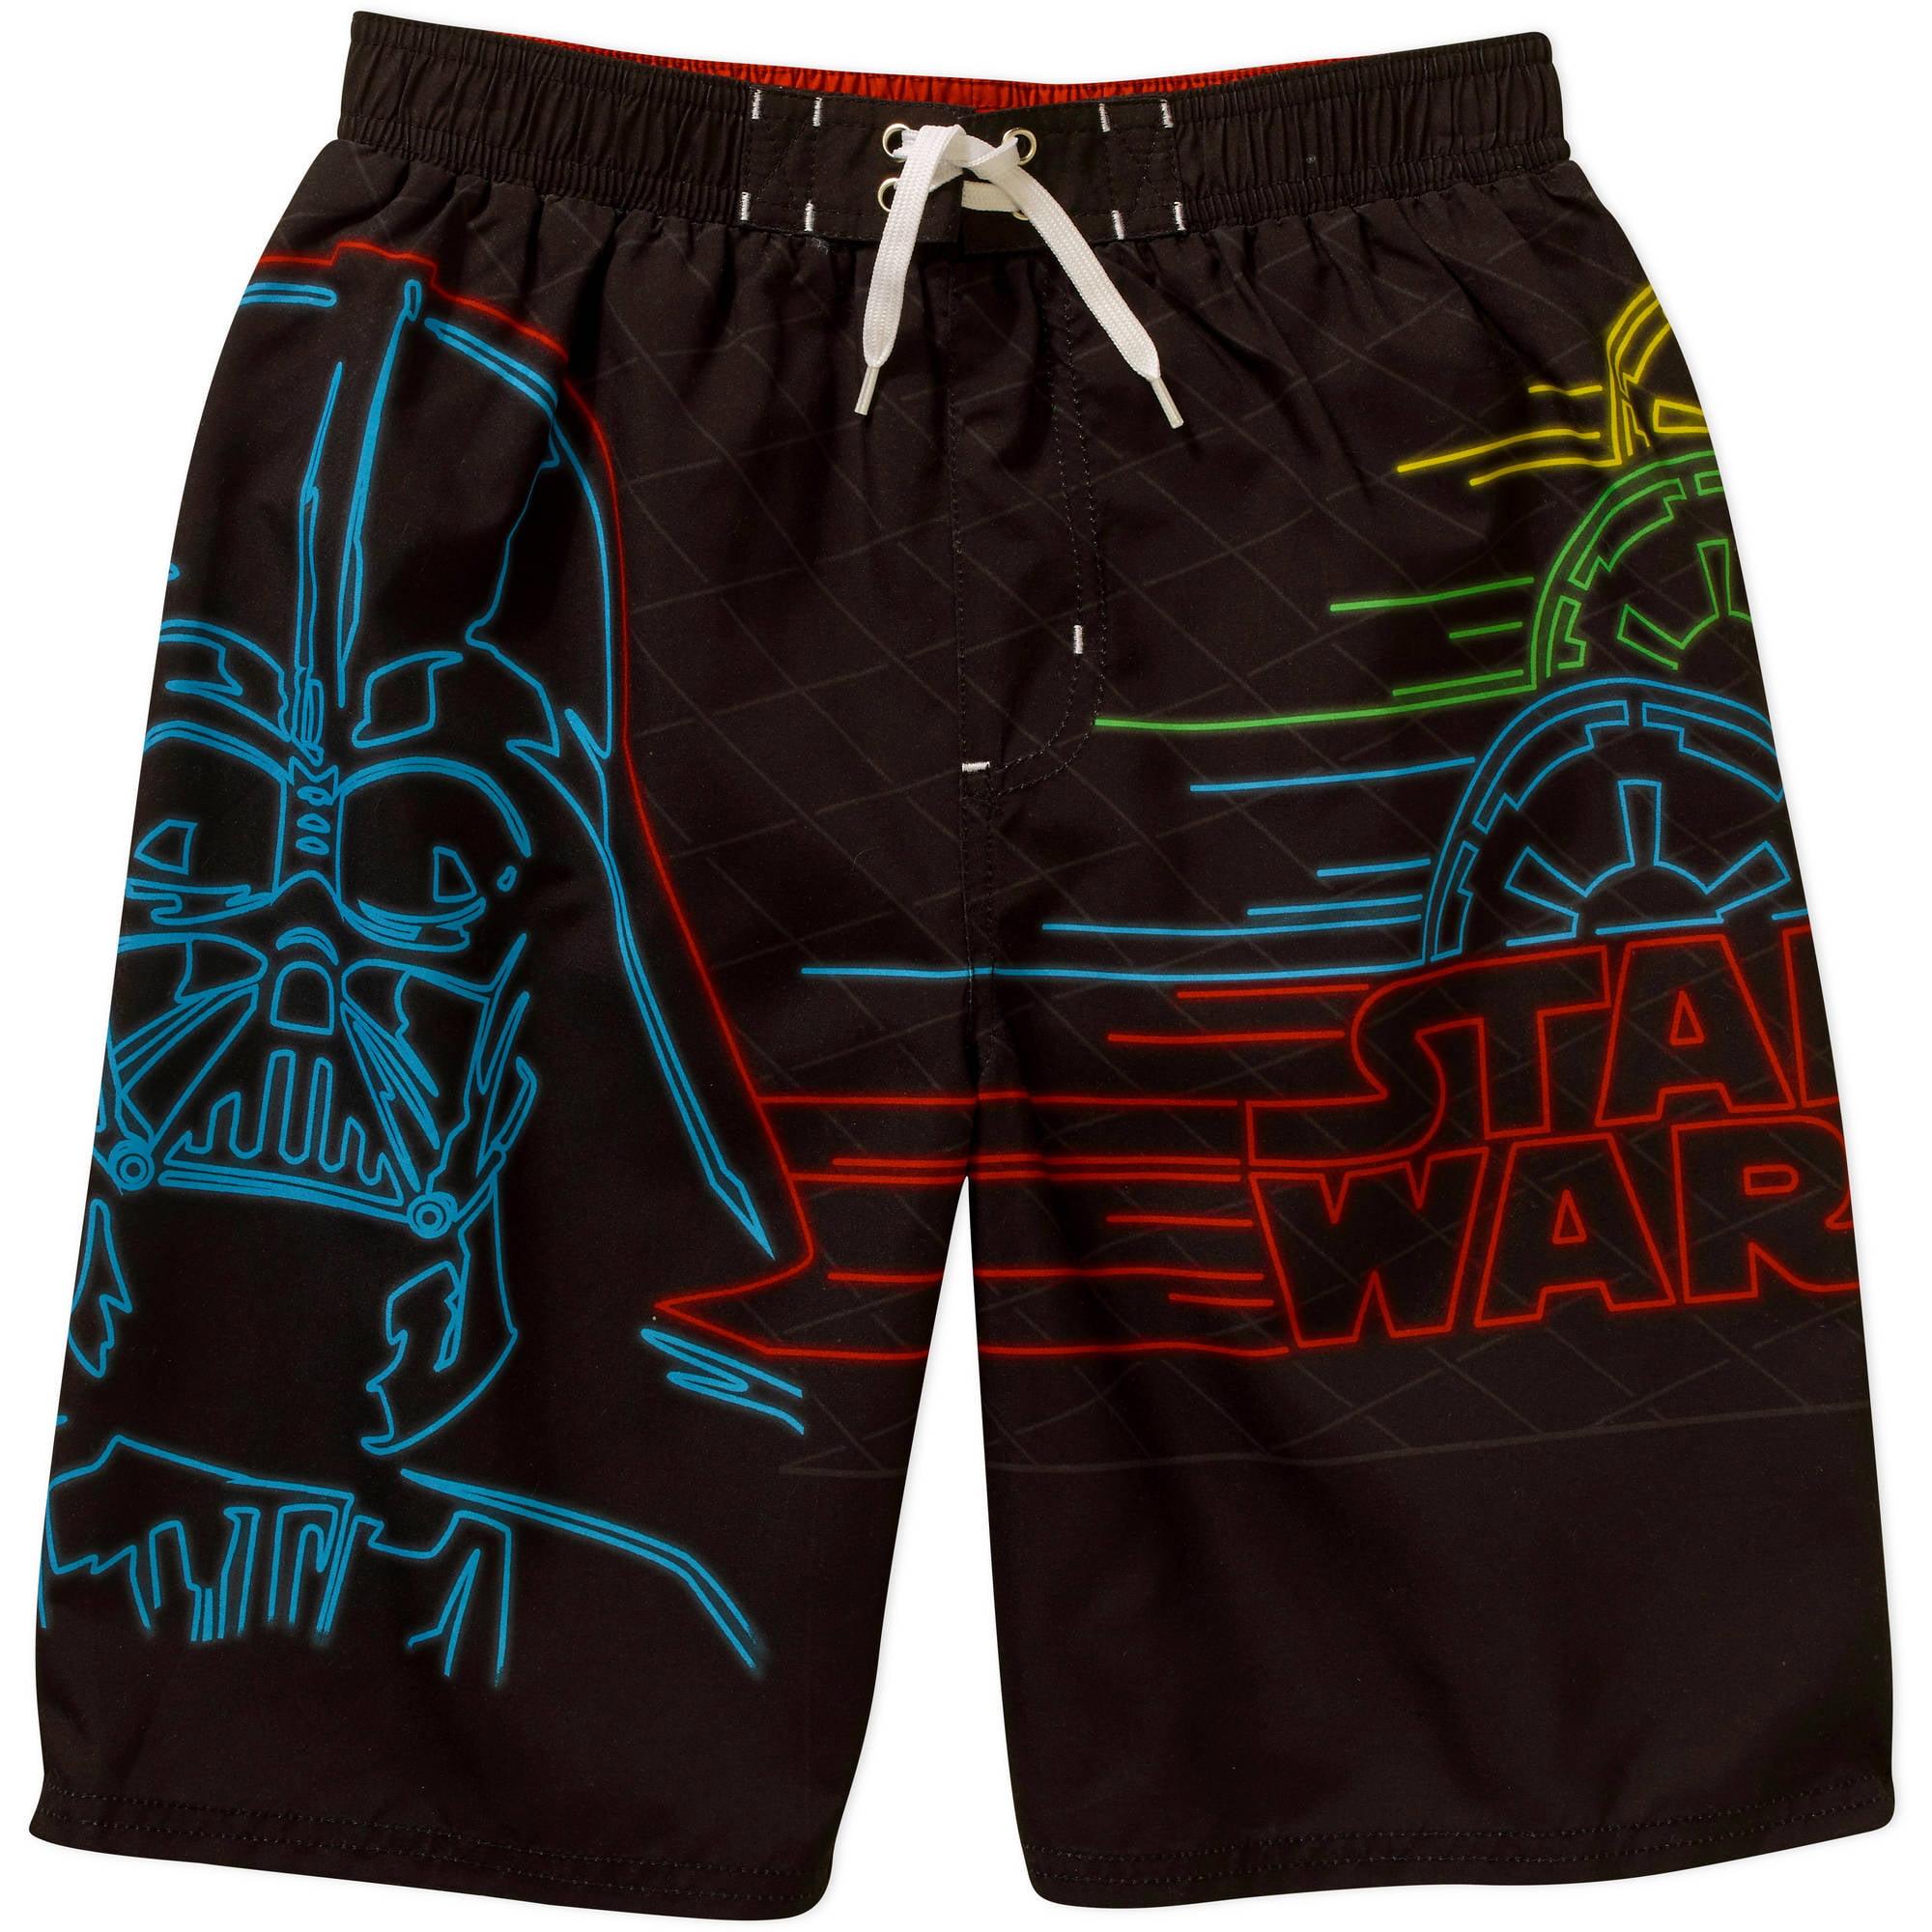 09889fc27e55a ONLINE - Star Wars Boys Swim Shorts - Walmart.com